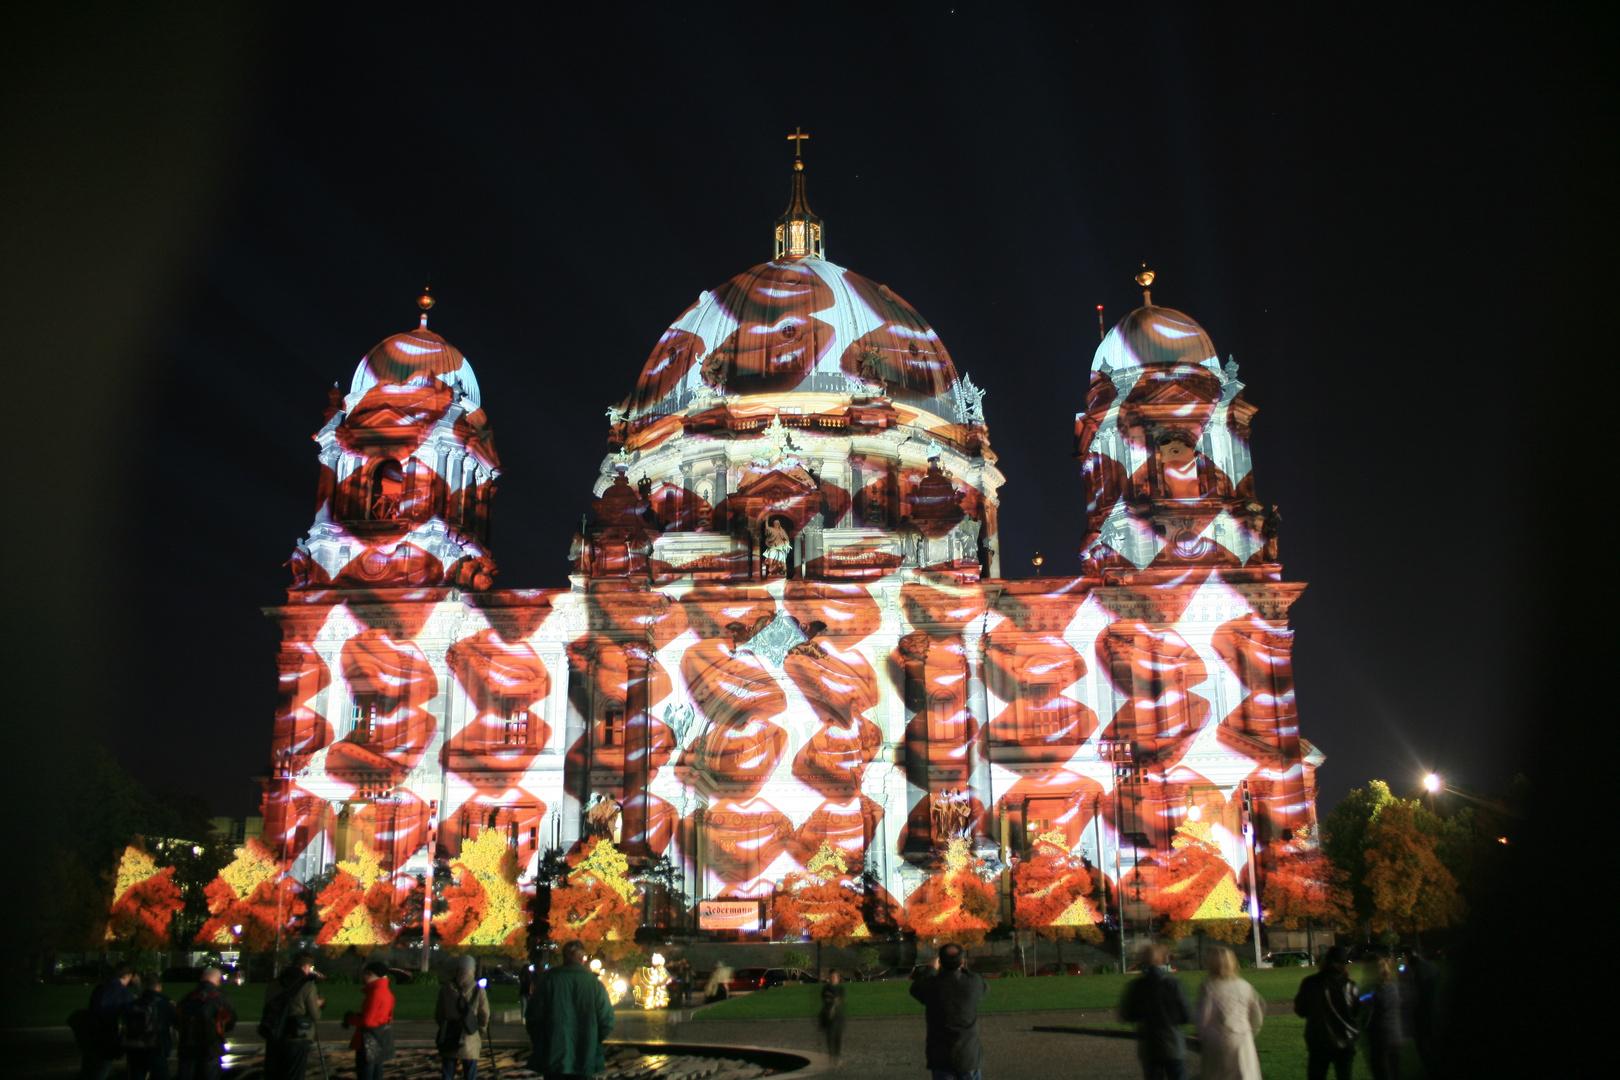 Festival of Lights 2013 Berliner Dom ;-)